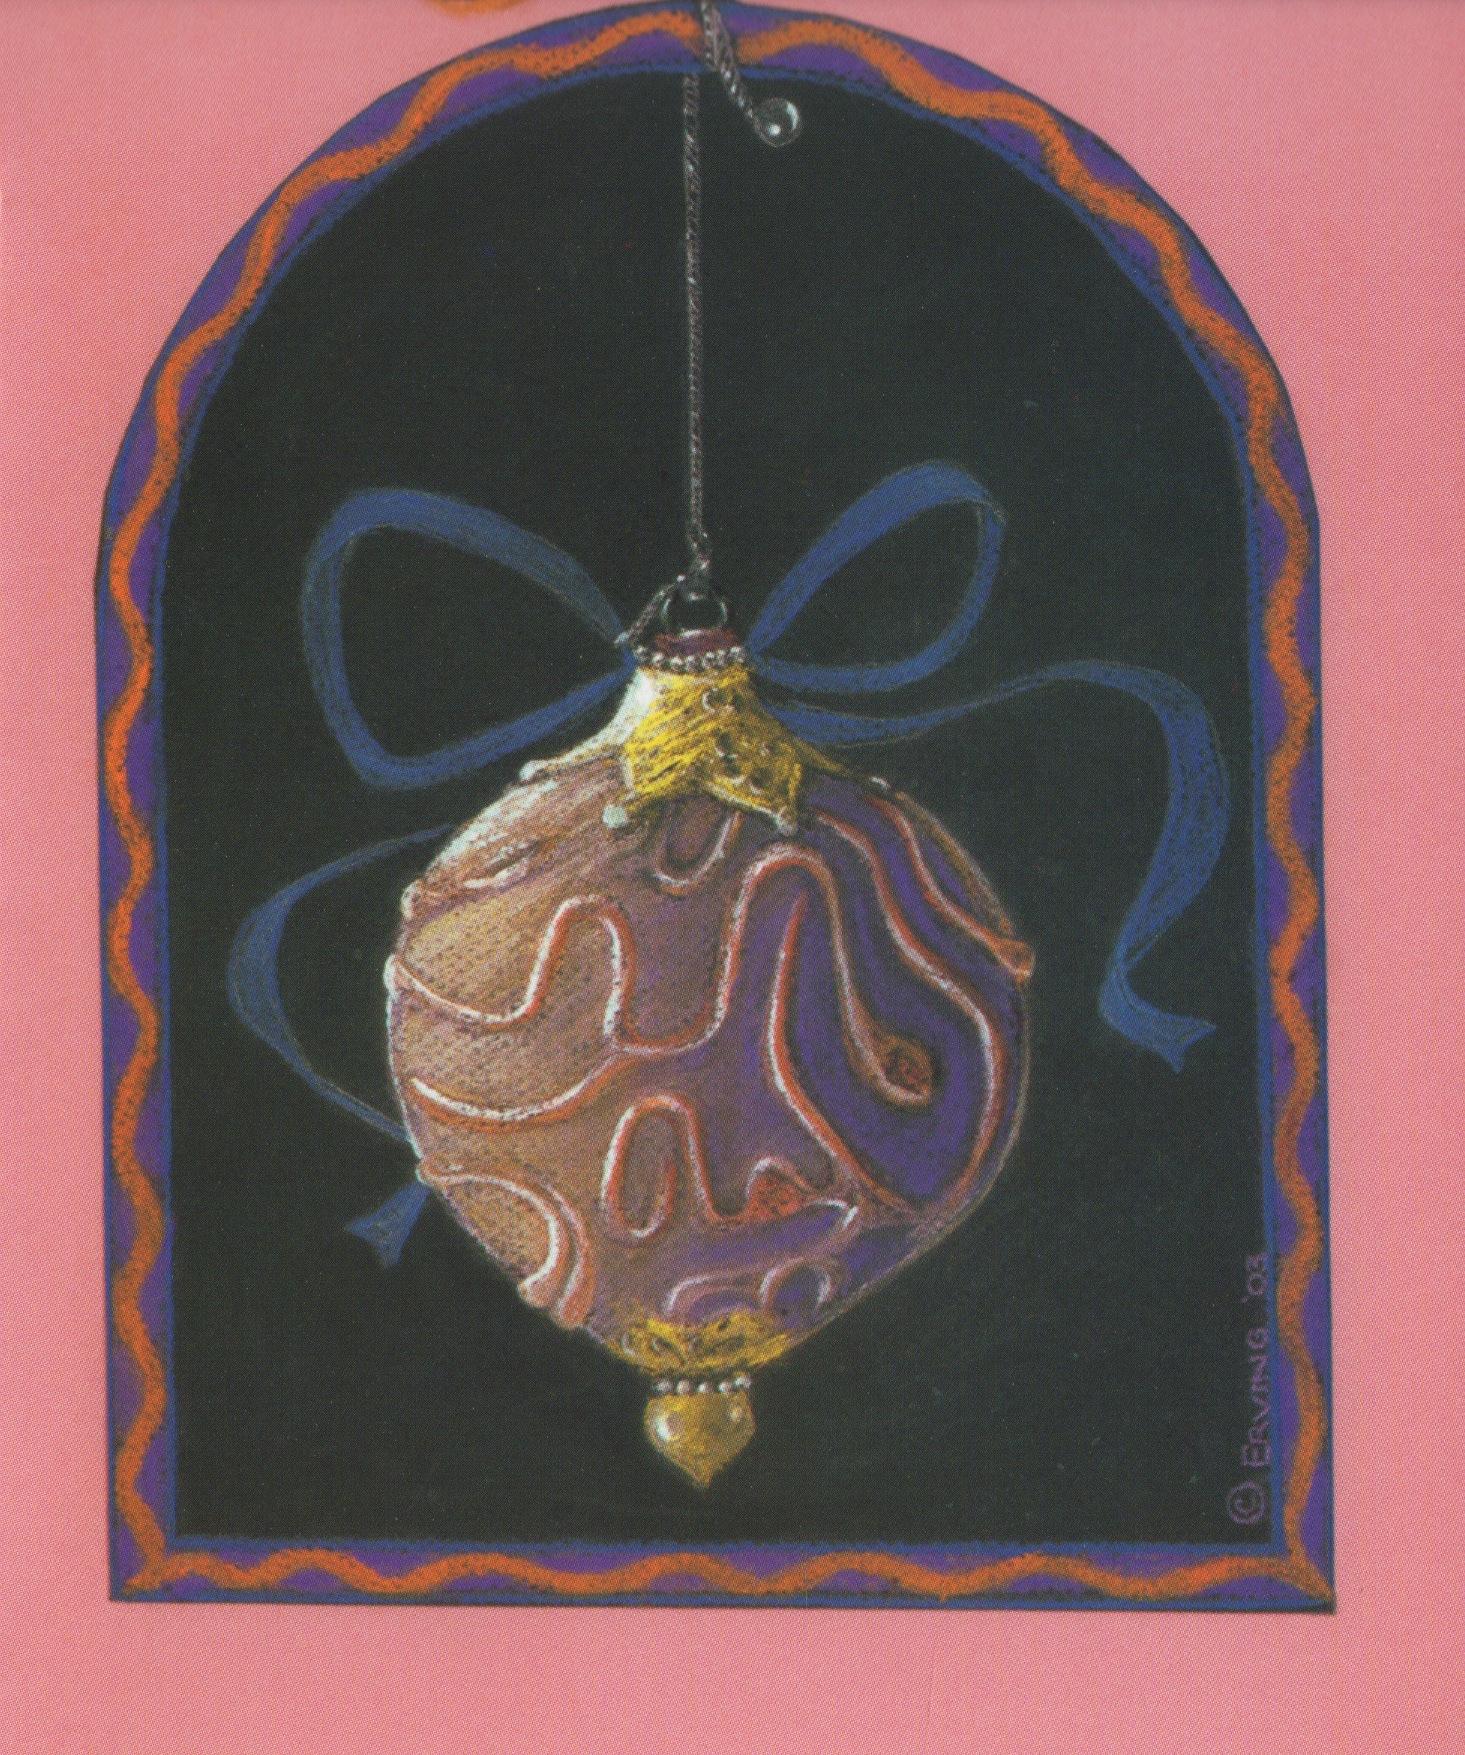 Christmas Cards Spiritual Assortment JonMar Greeting Cards